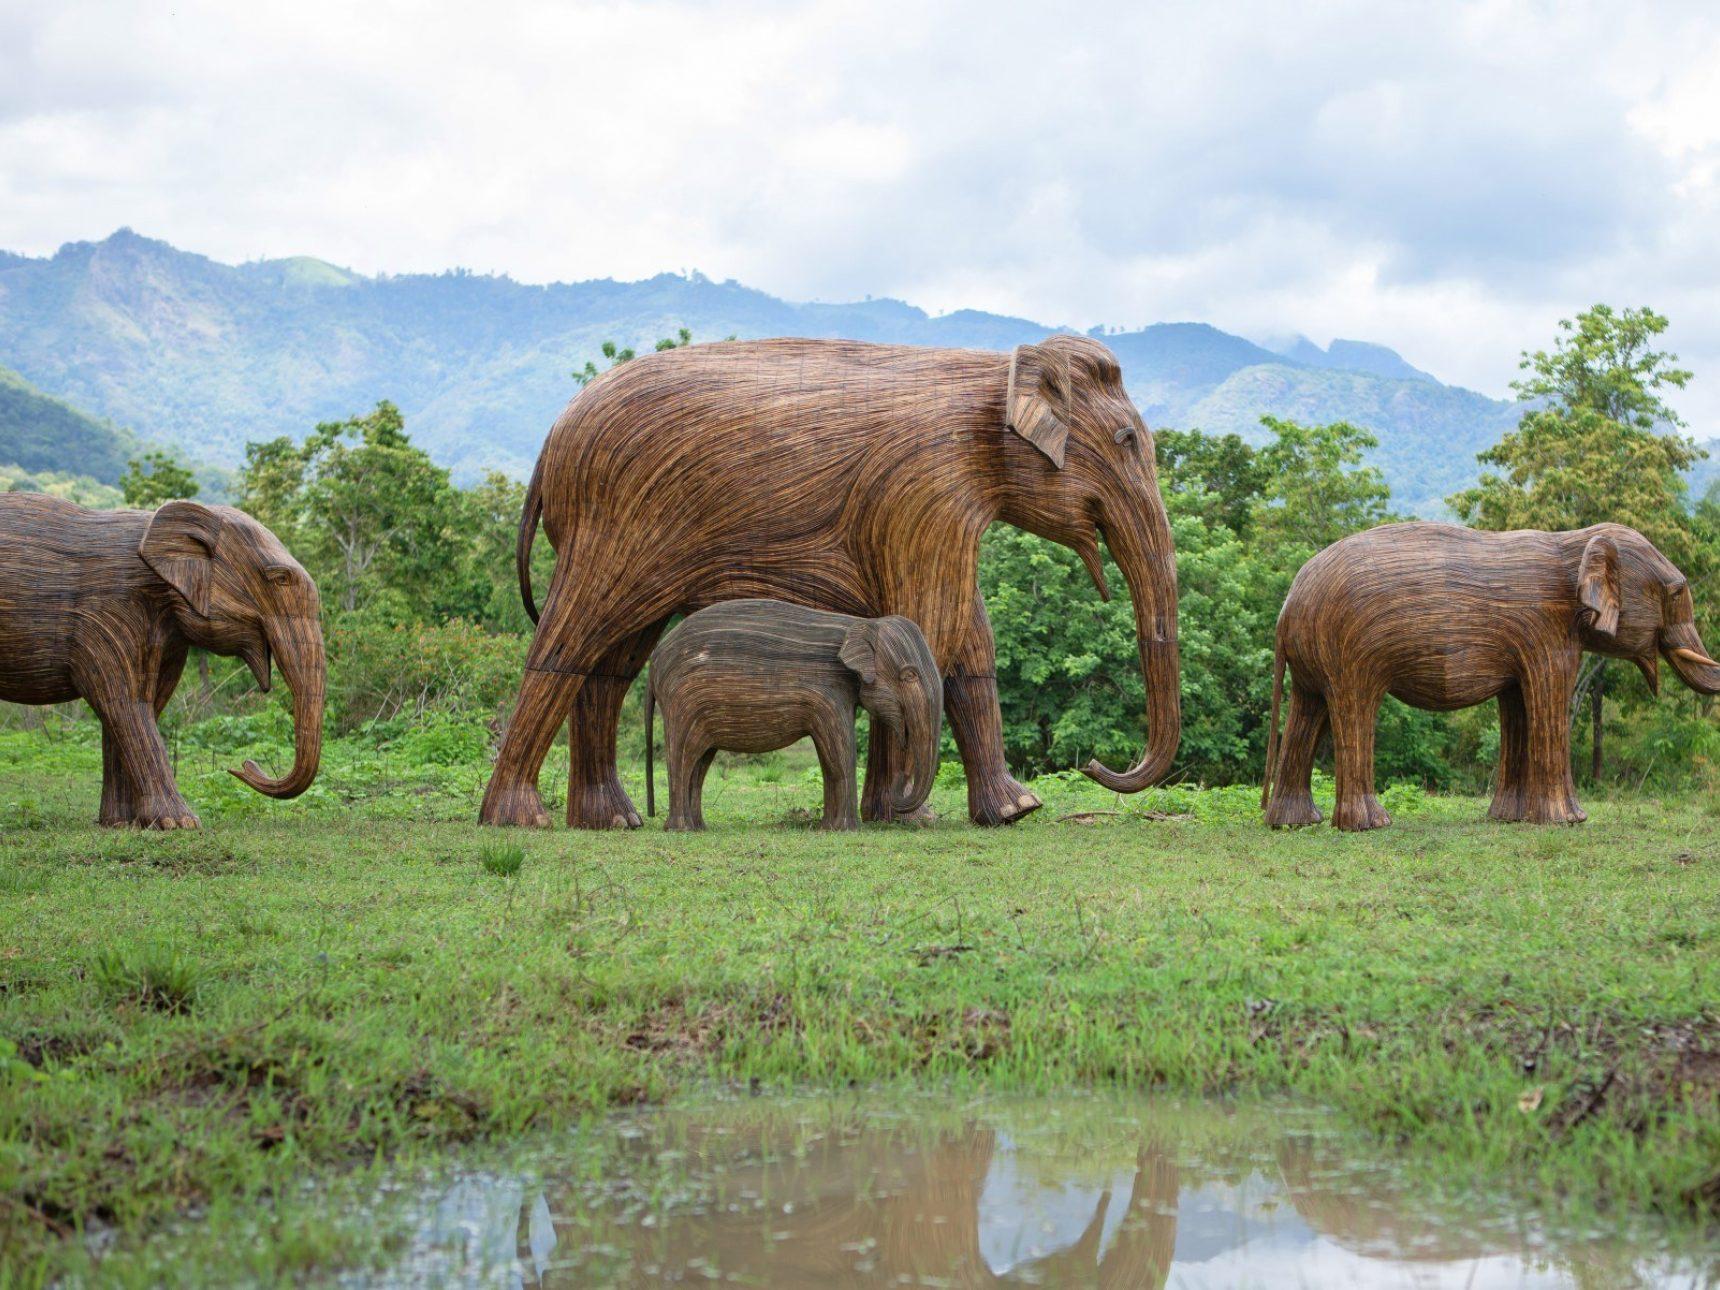 Herd of four elephants walking through grasslands